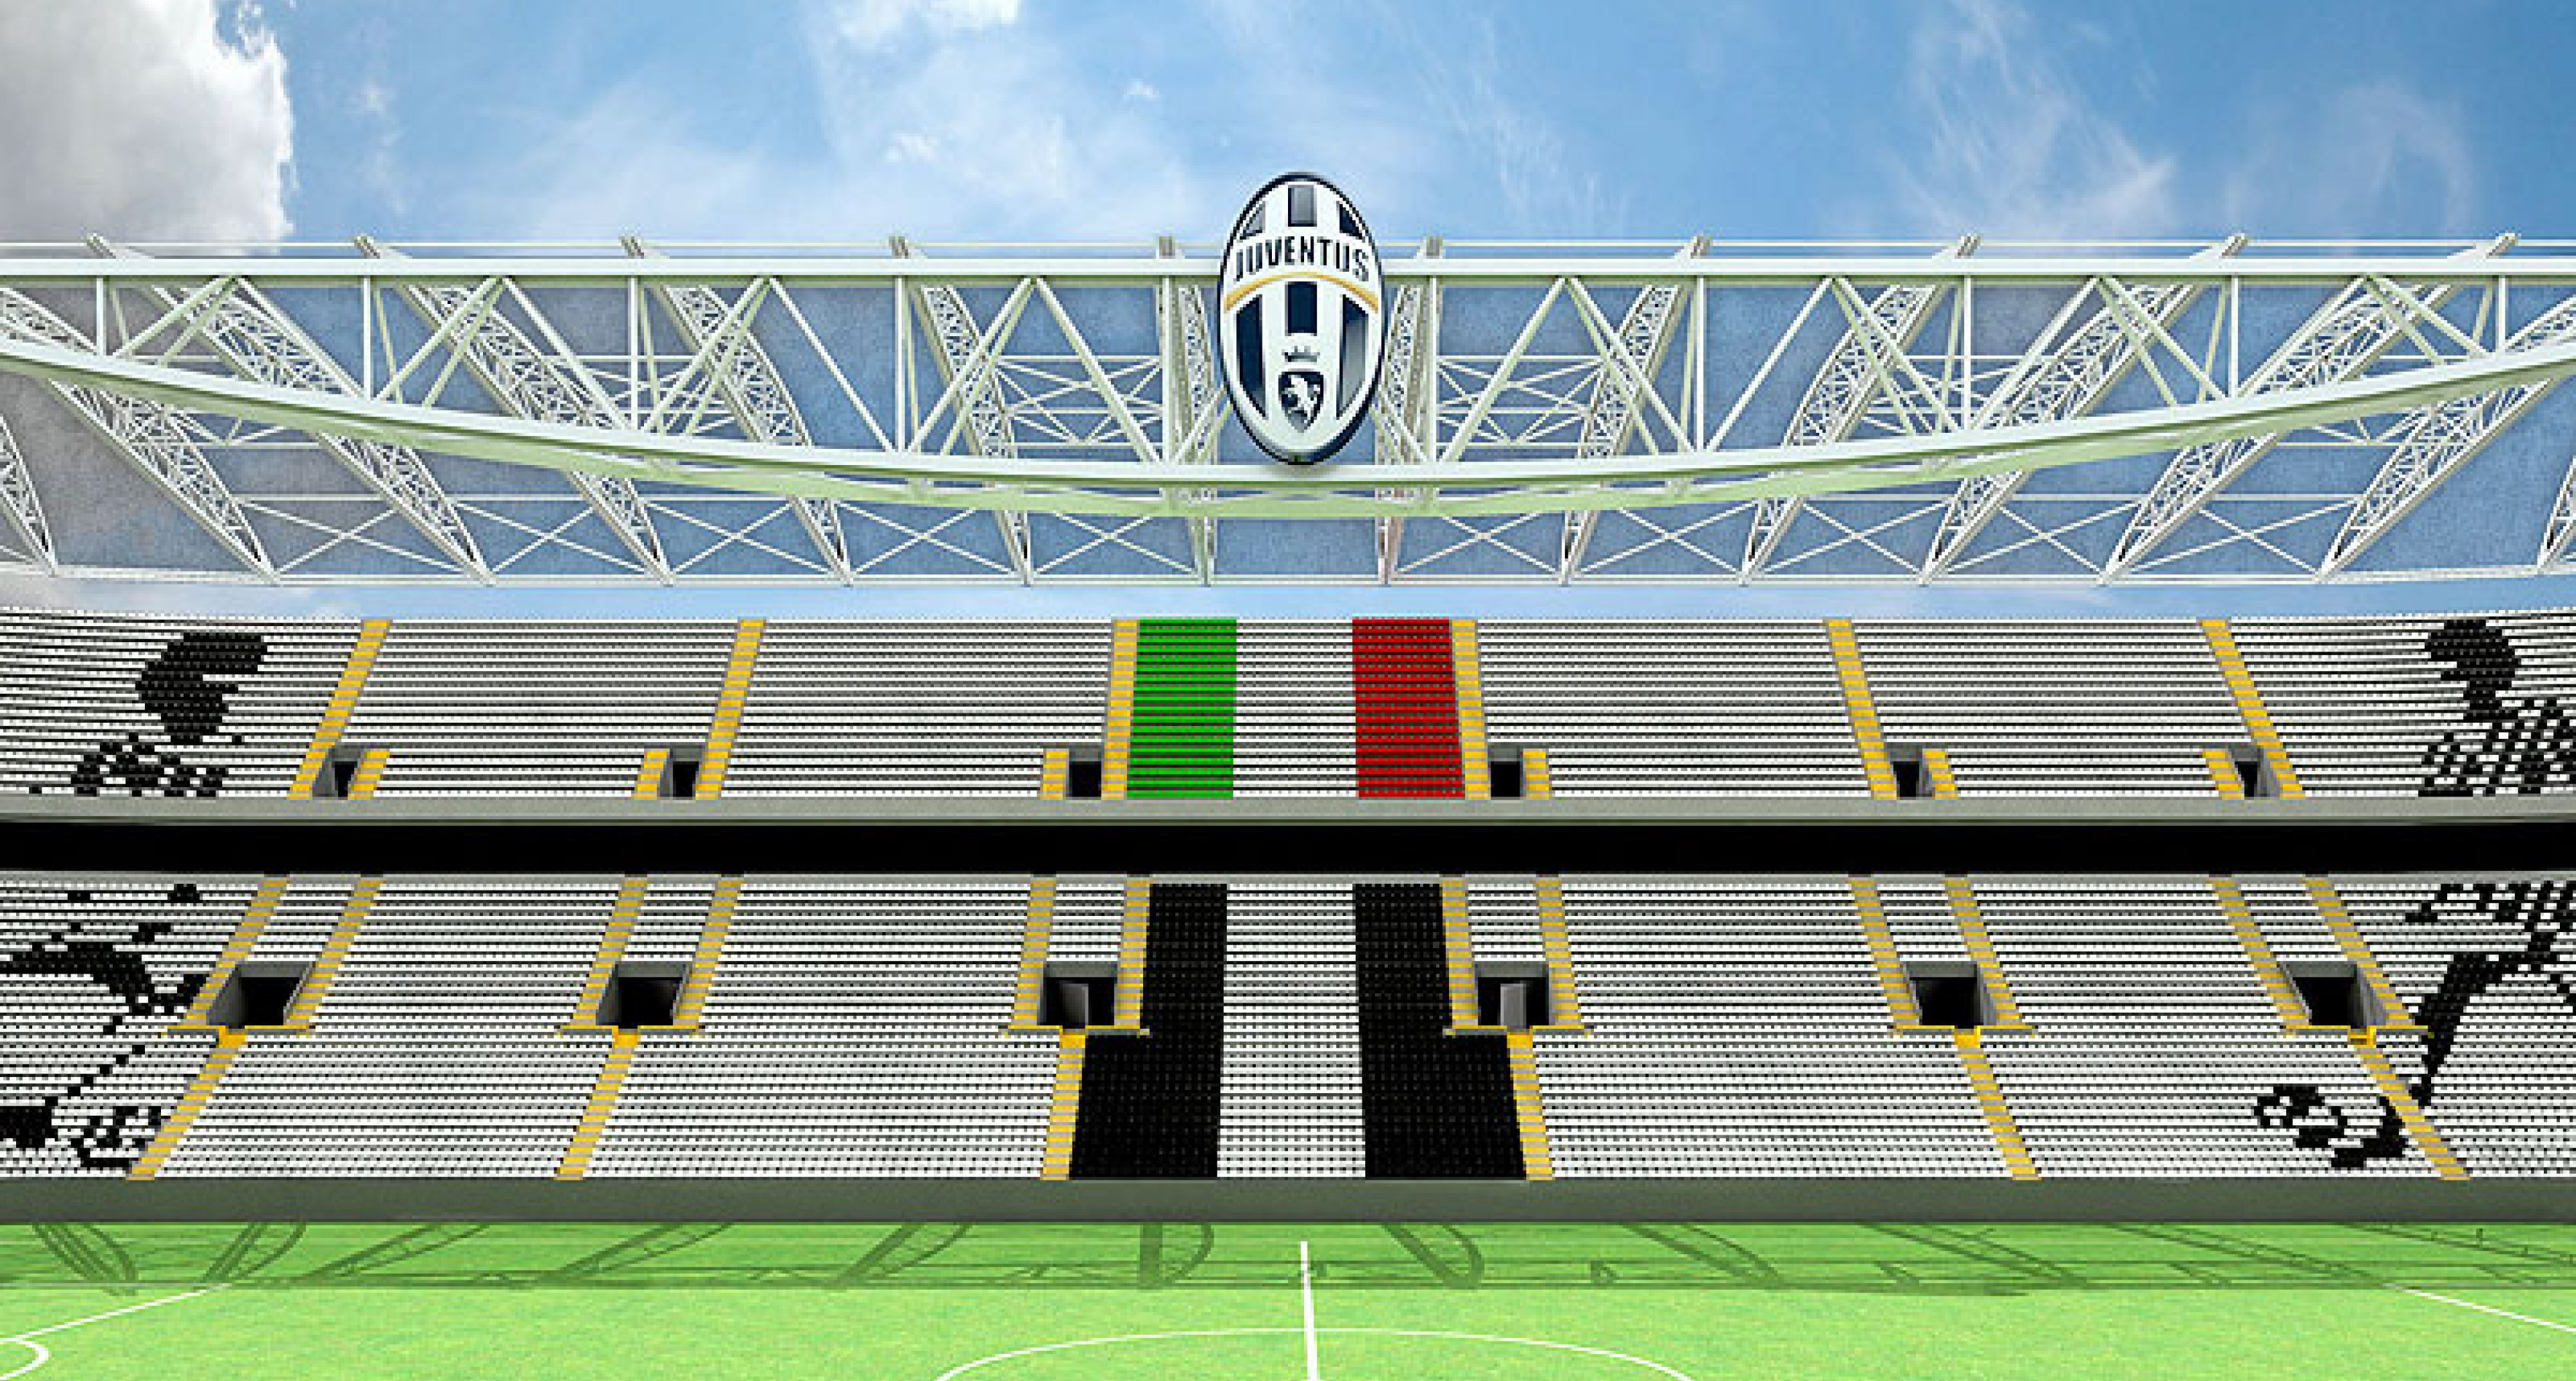 pininfarina designs interior of new juventus stadium turin classic driver magazine juventus stadium turin